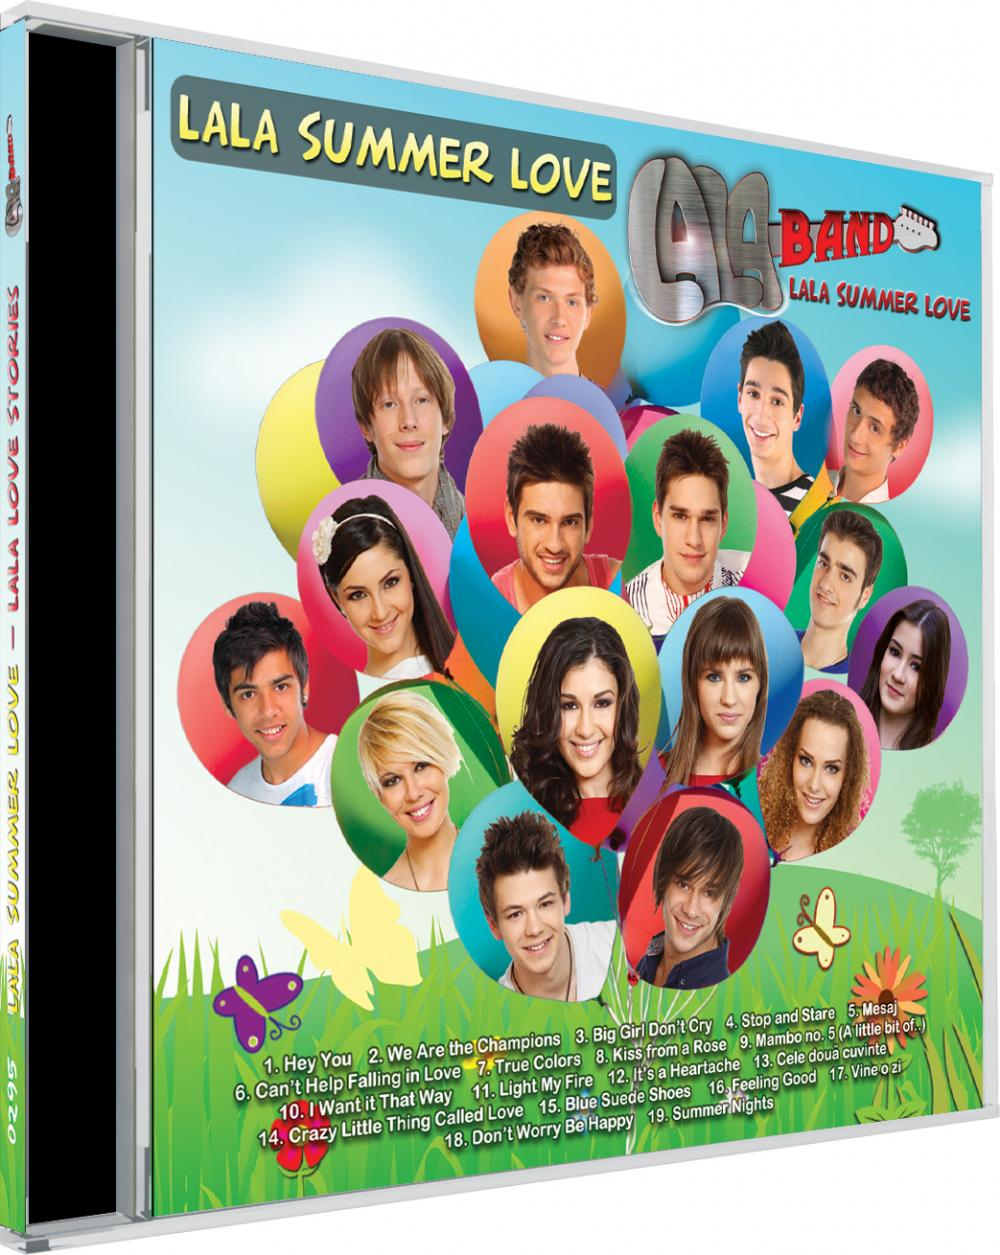 LALA SUMMER LOVE (2CD)